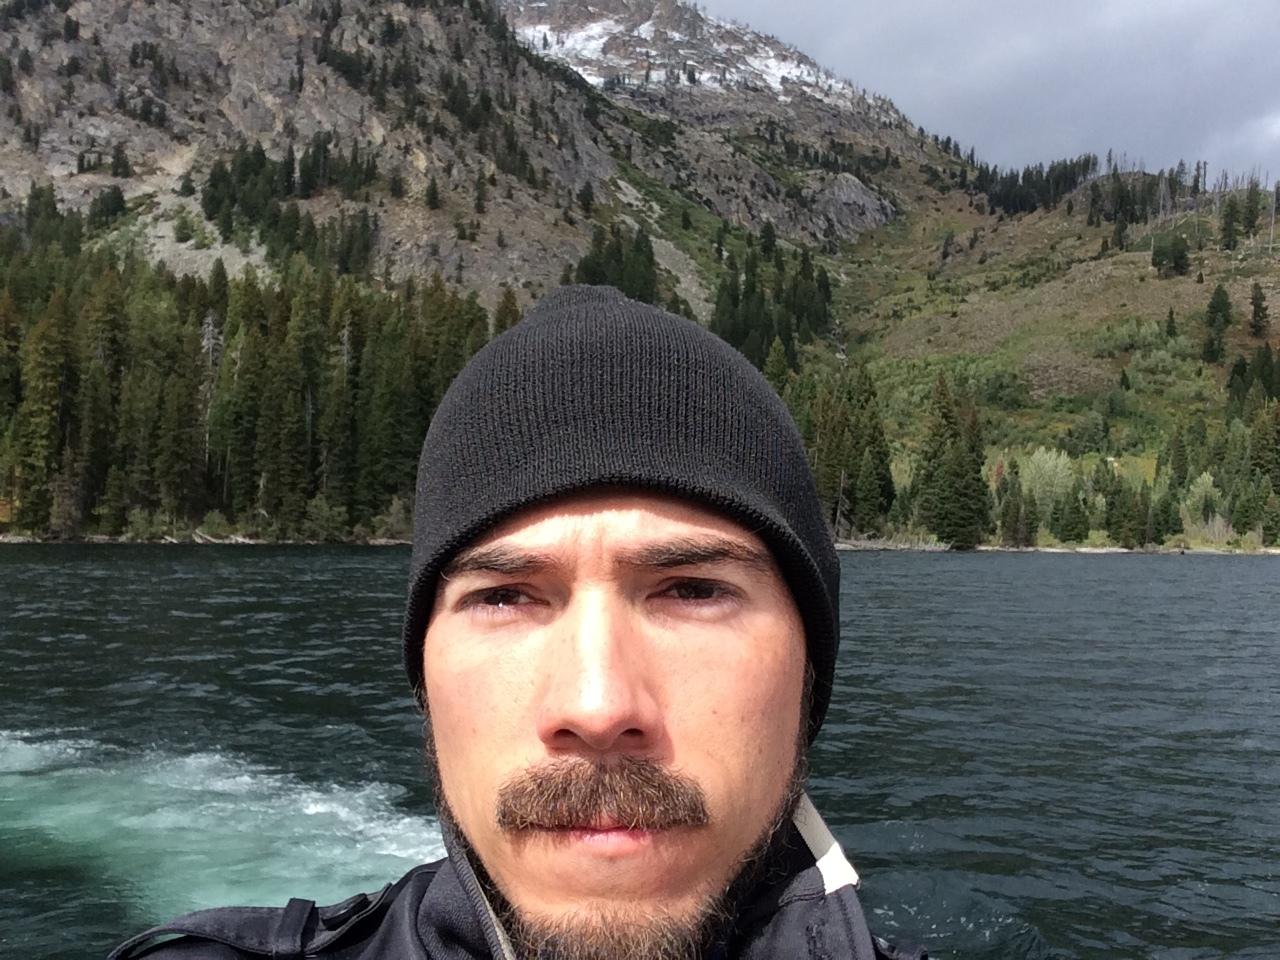 Cruisin' on Jenny Lake in the Tetons.